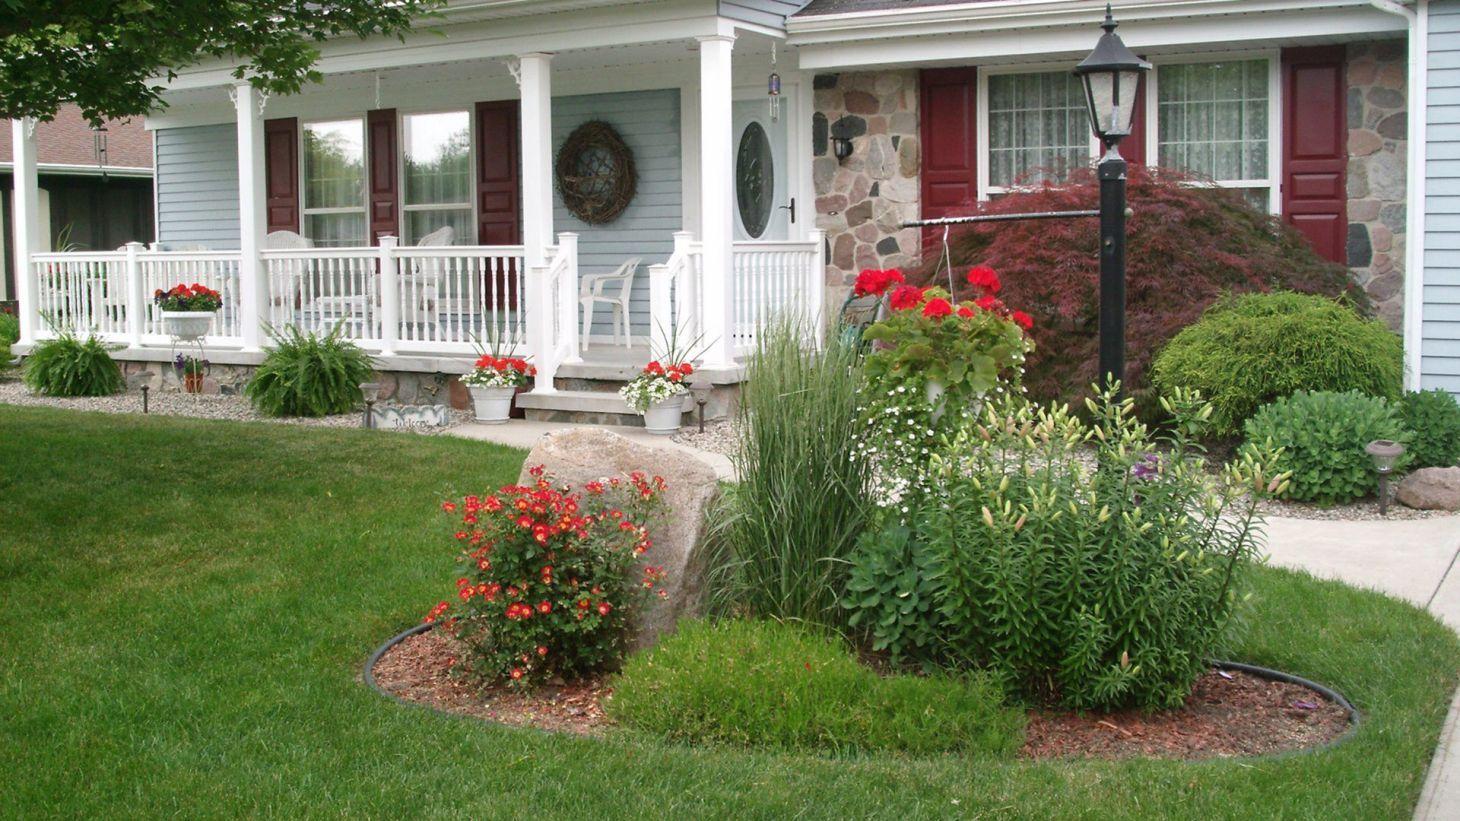 10 Most Creative Front Garden Design Ideas For Your Home Front Yard Ideas Front Garden Design Front House Landscaping Front Yard Landscaping Design Landscaping ideas for house with front porch